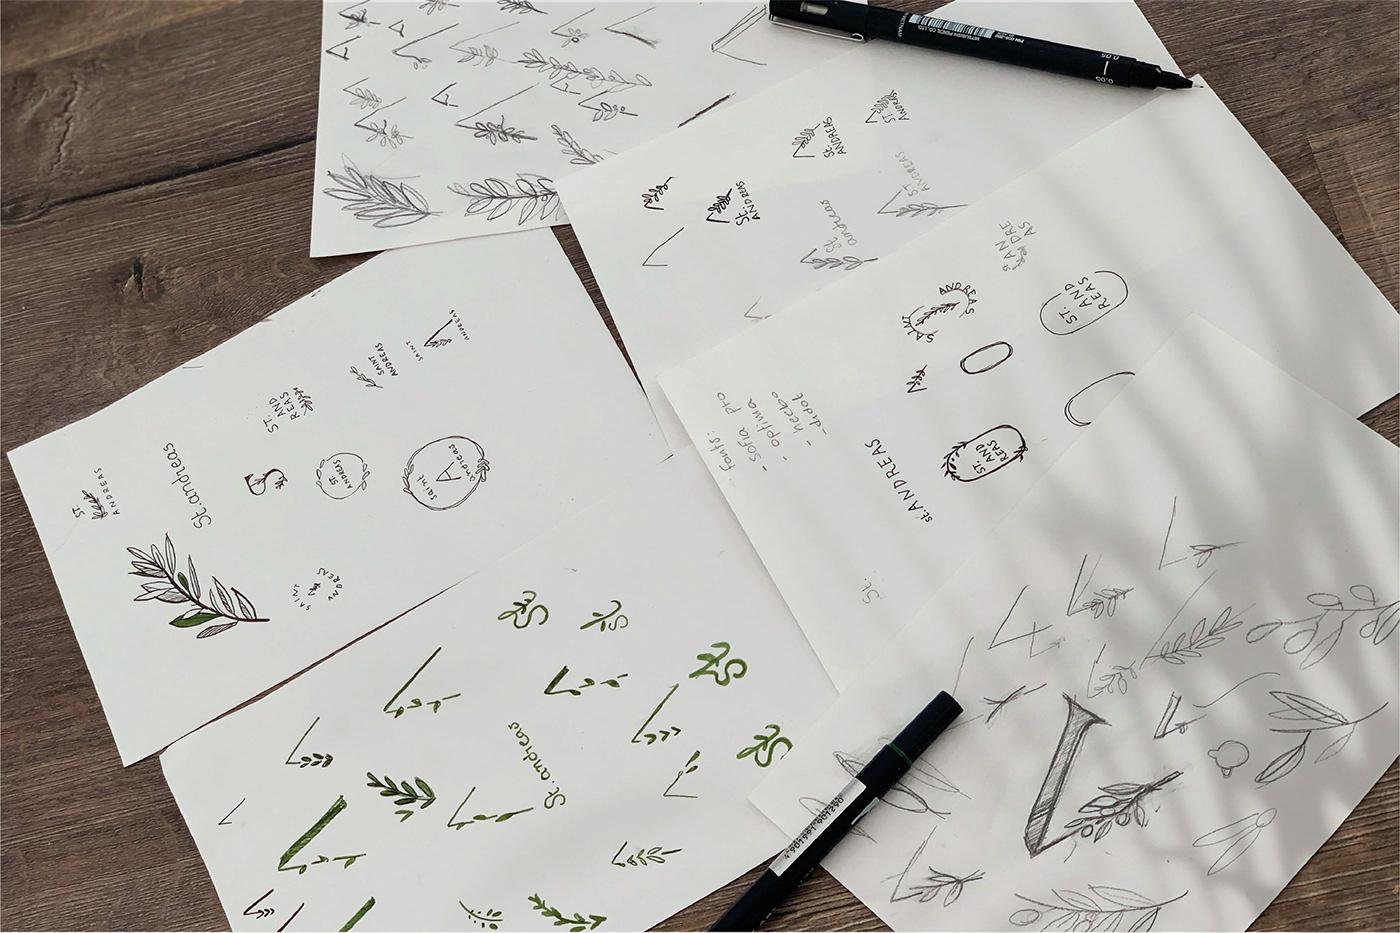 Image may contain: handwriting, envelope and drawing